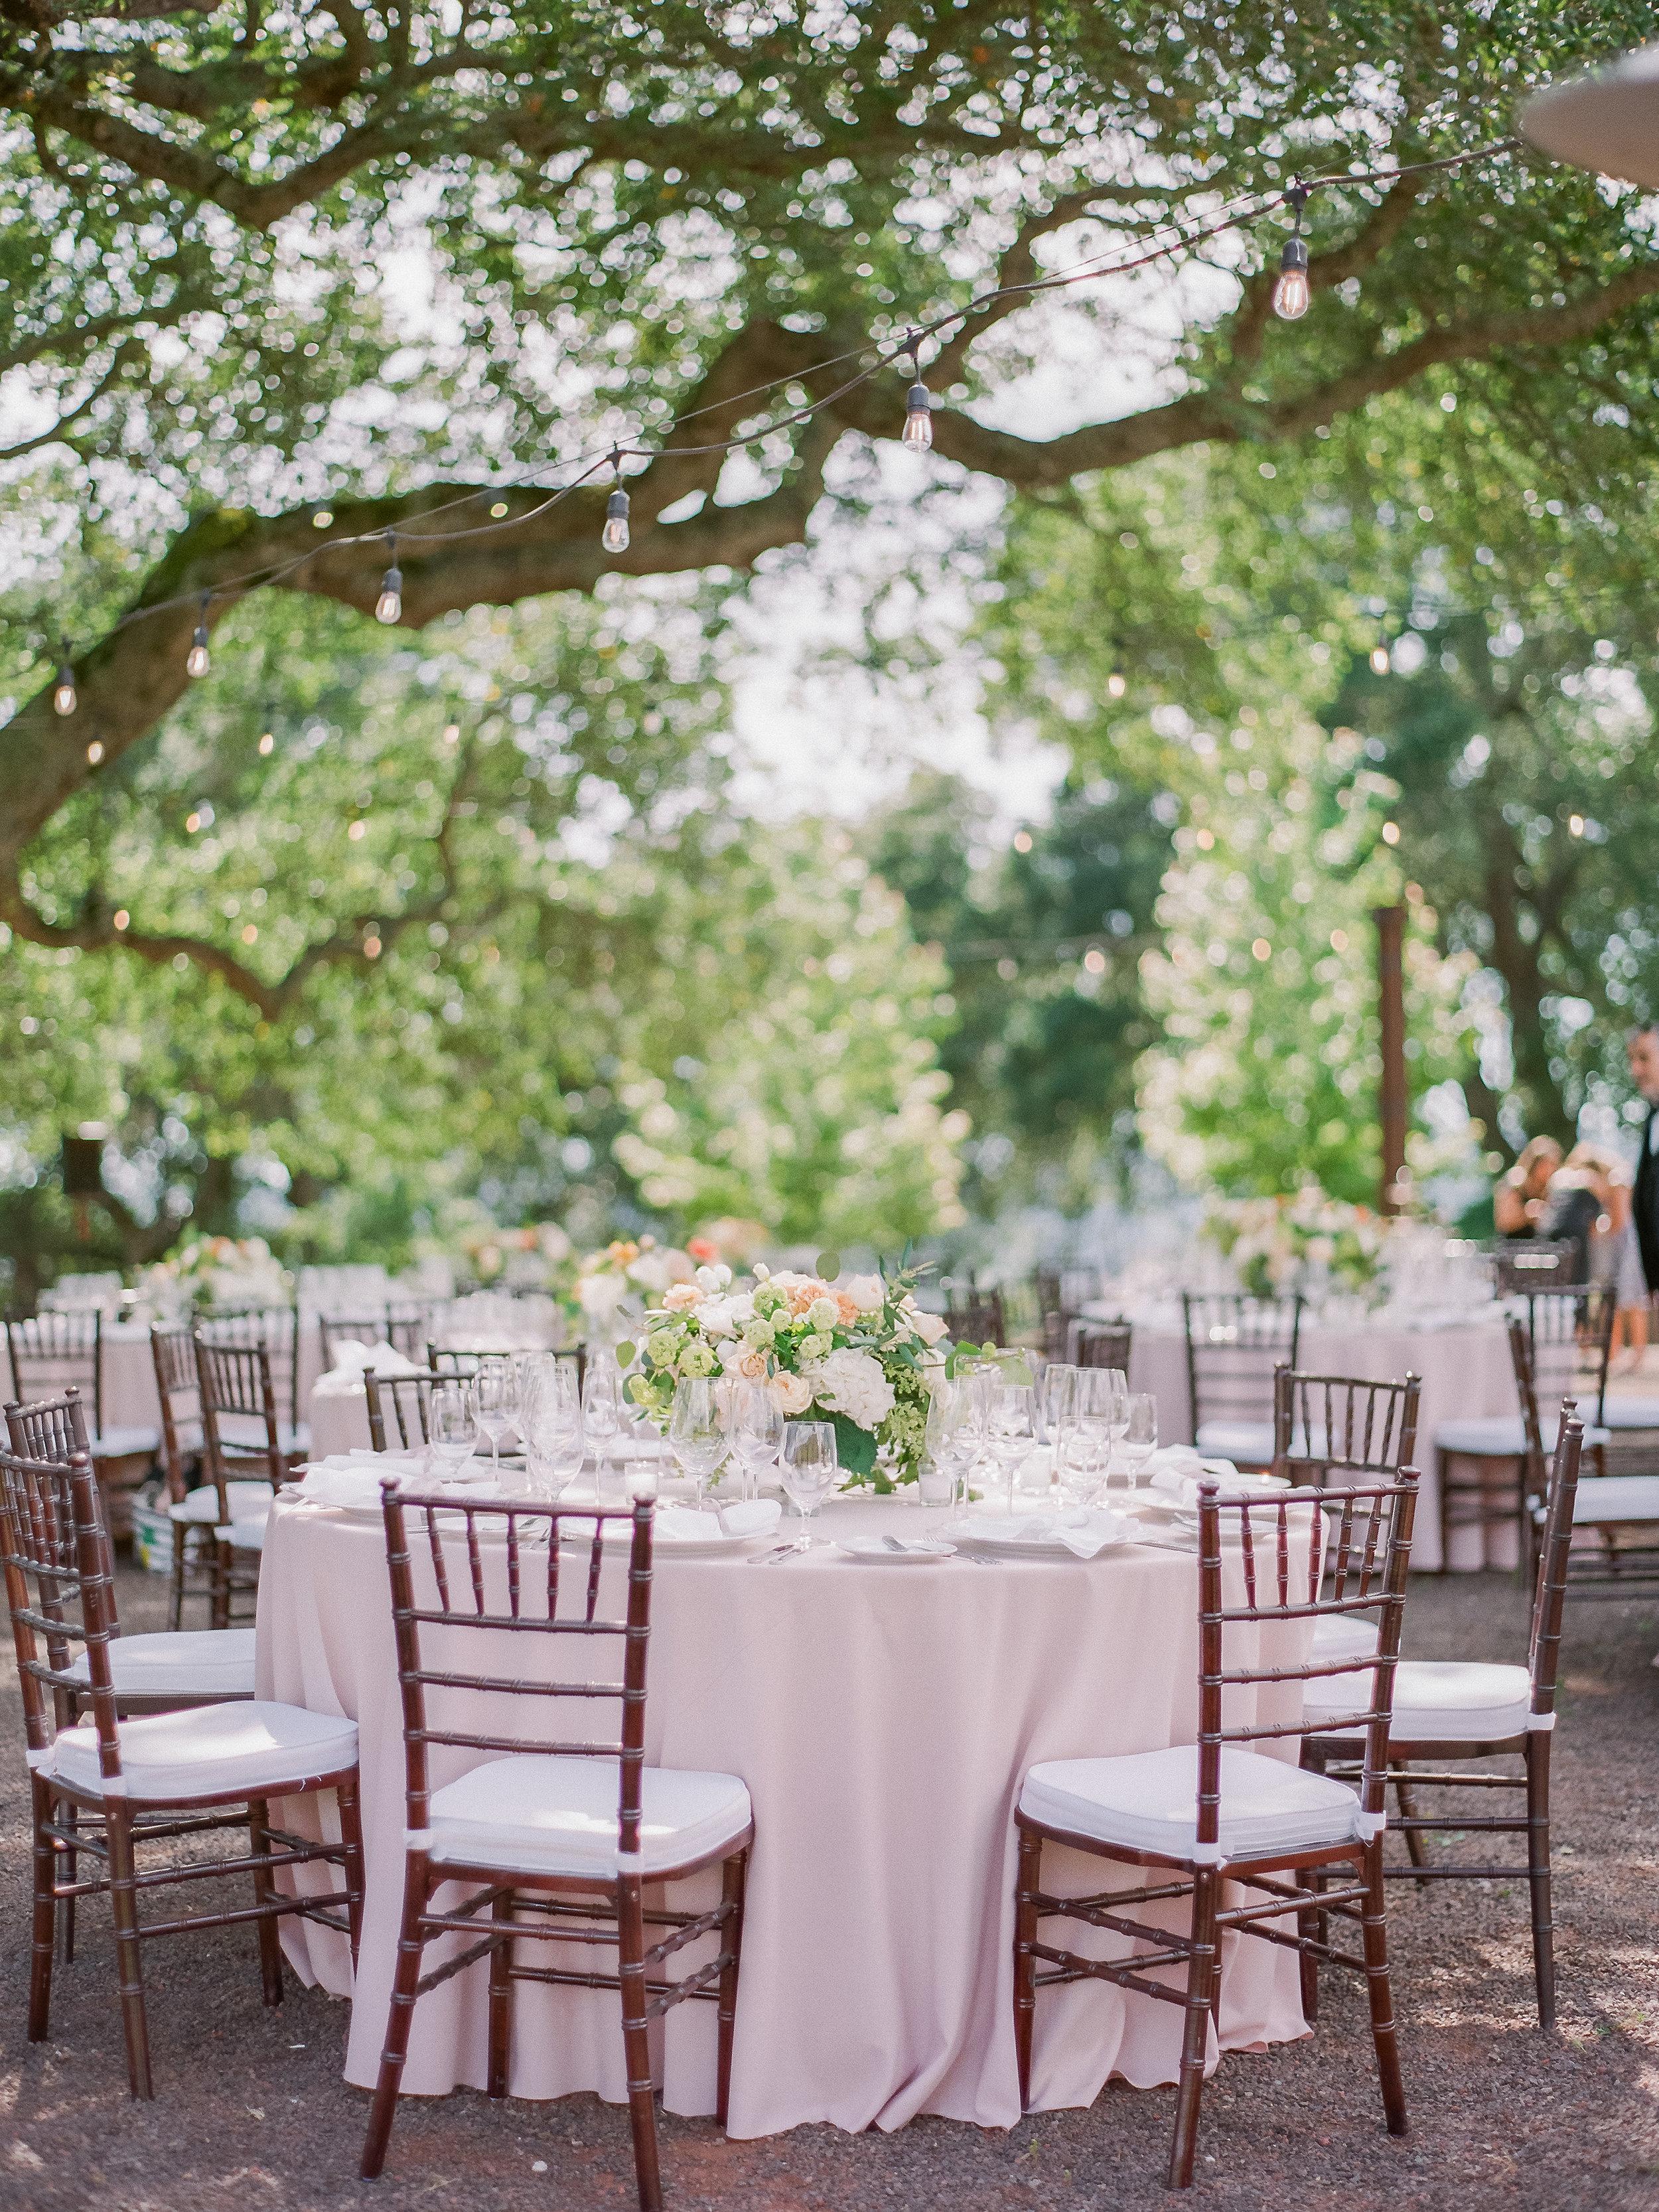 california-wedding-day-lrelyea-events-lori-paladino-photography11.jpg